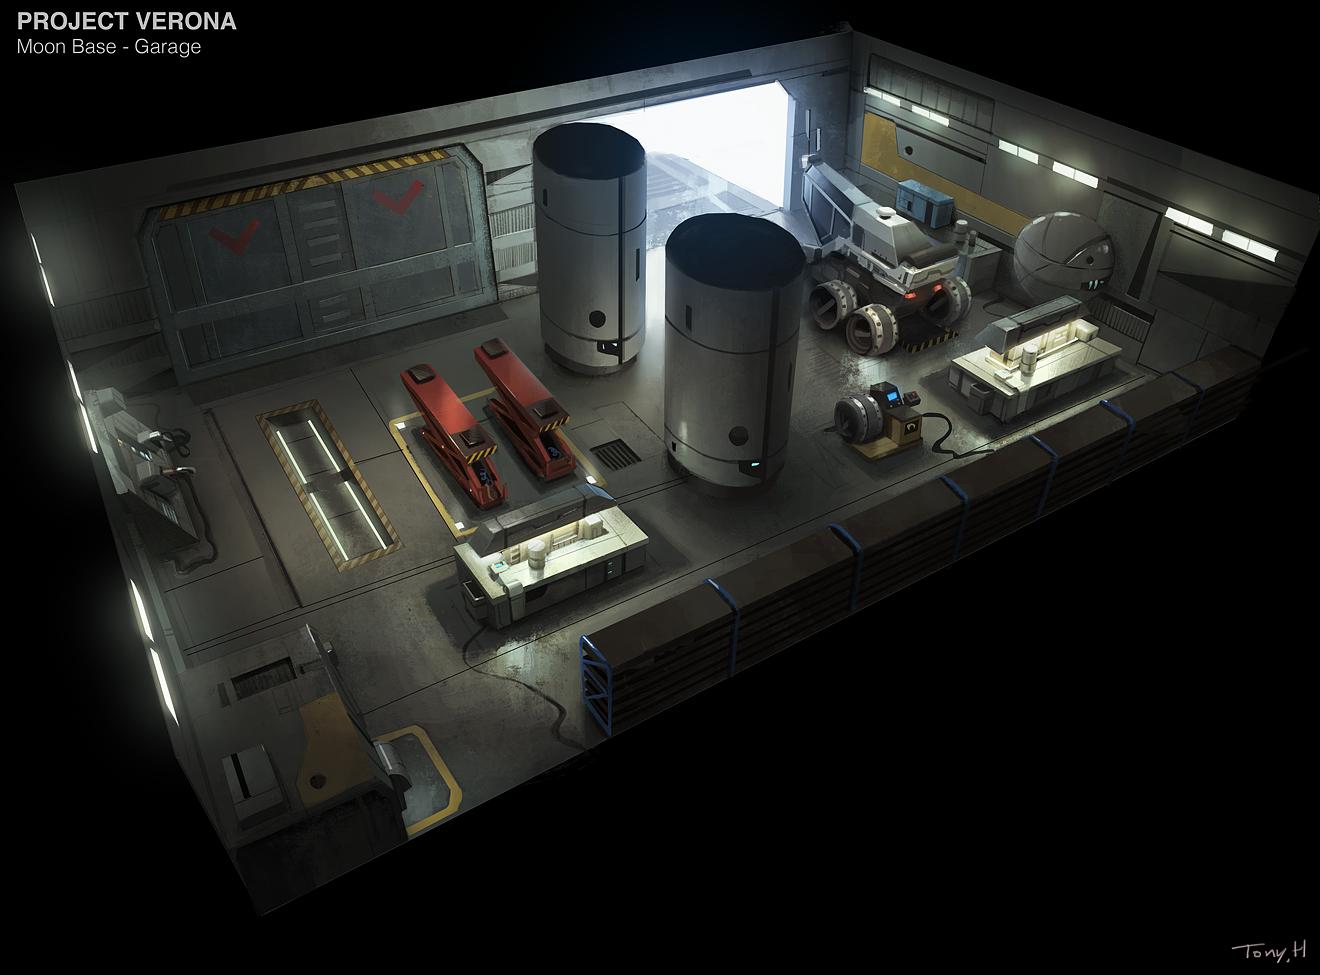 Moon base - hangar. Modo & Photoshop.